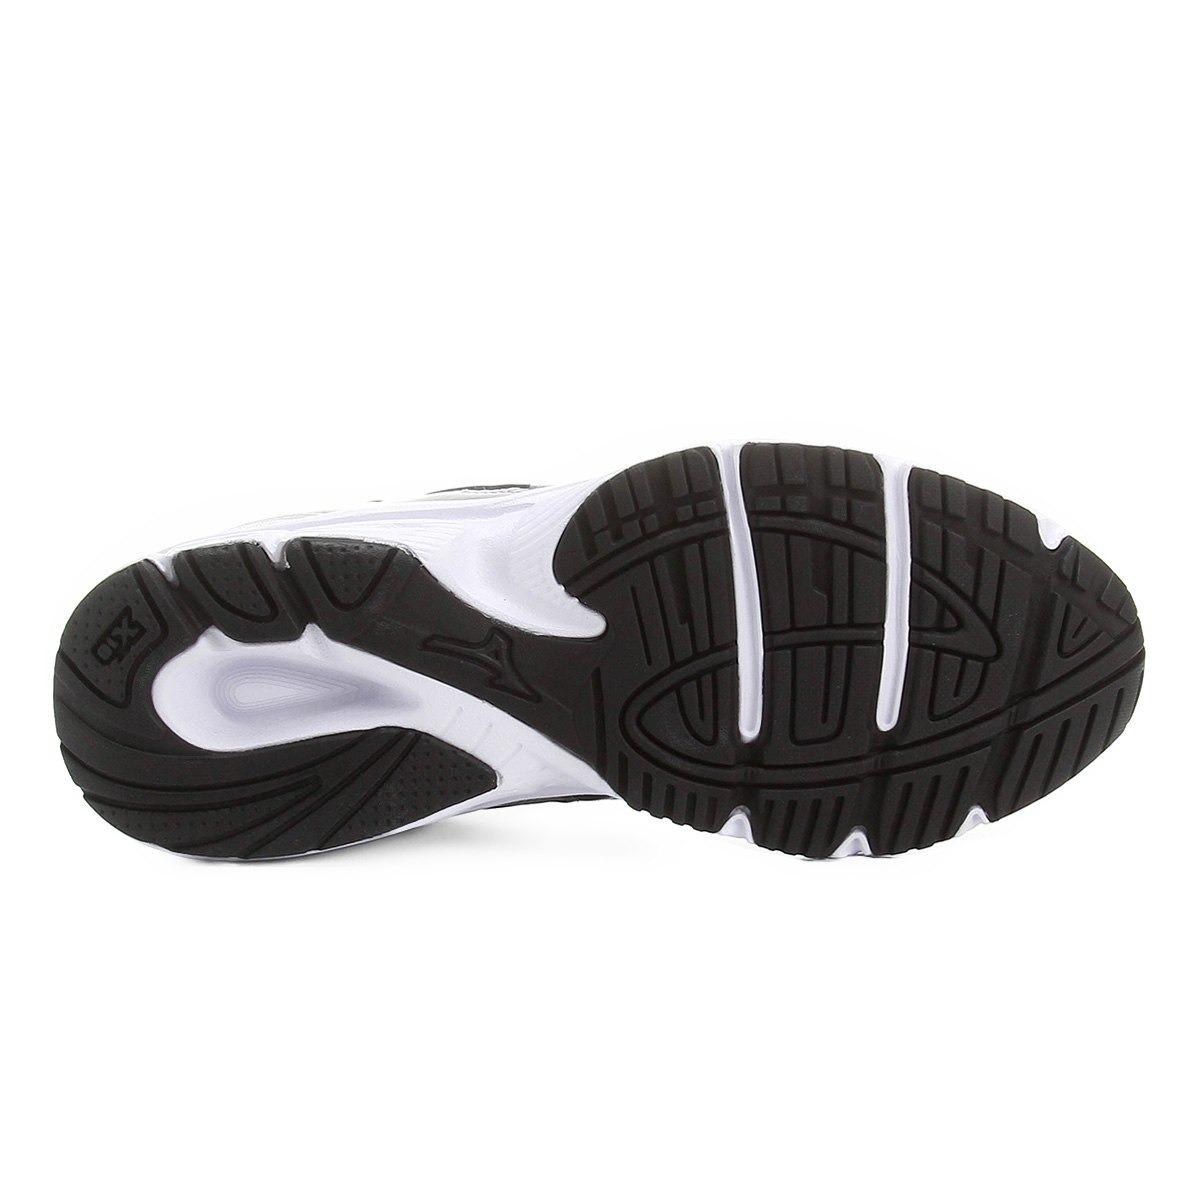 064c227cc5 tênis mizuno spark masculino branco preto tamanho 43. Carregando zoom.